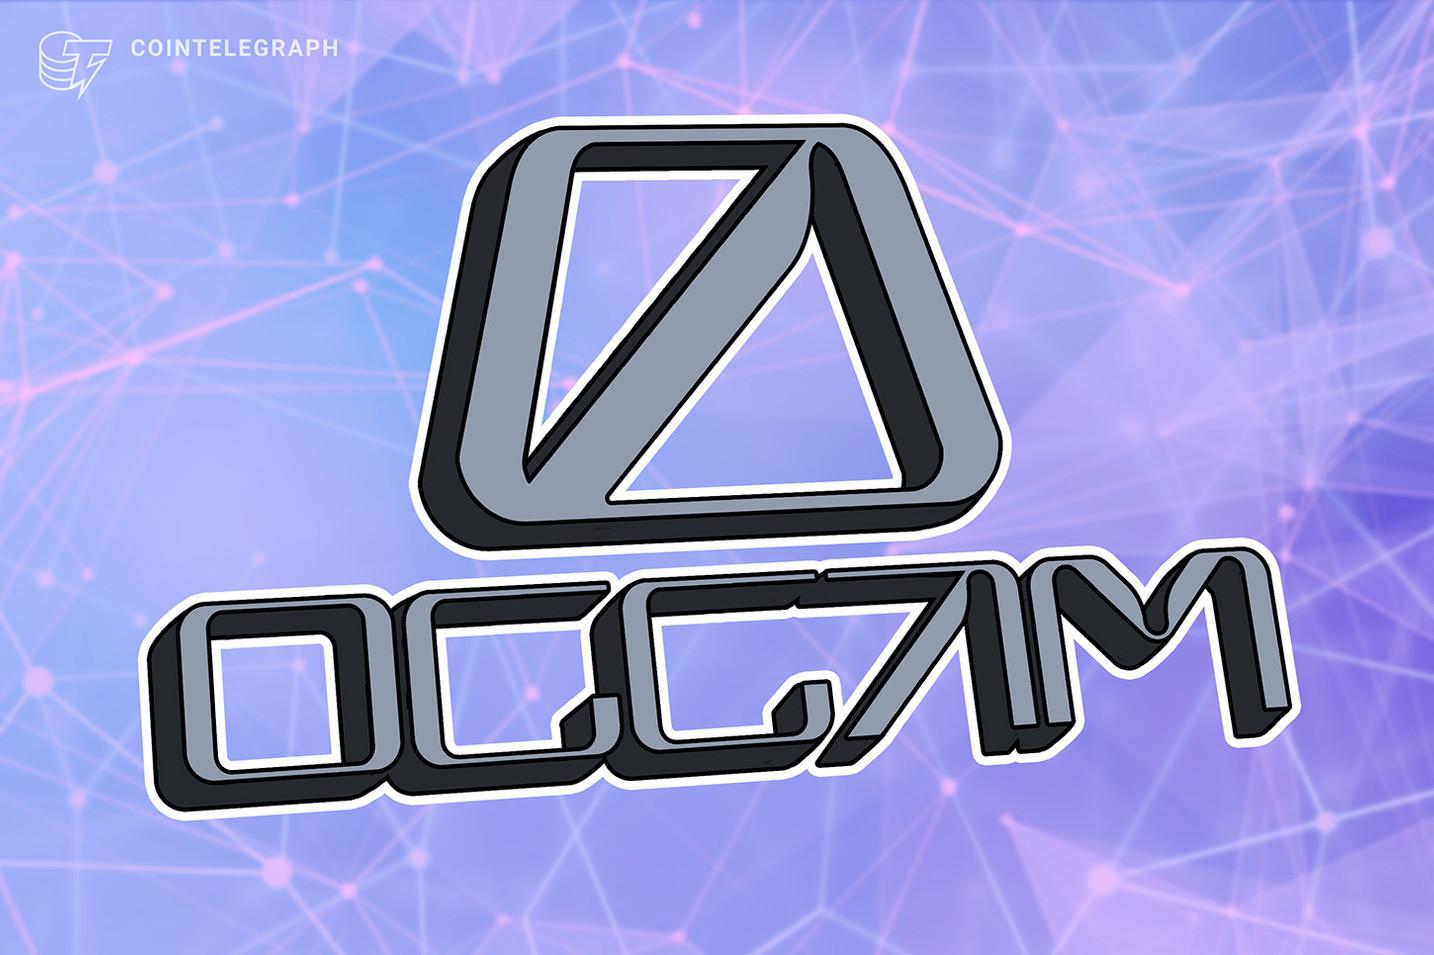 Bitcoin.com Exchange to accommodate Occam's Ethereum-to-Cardano Cross-Chain bridge